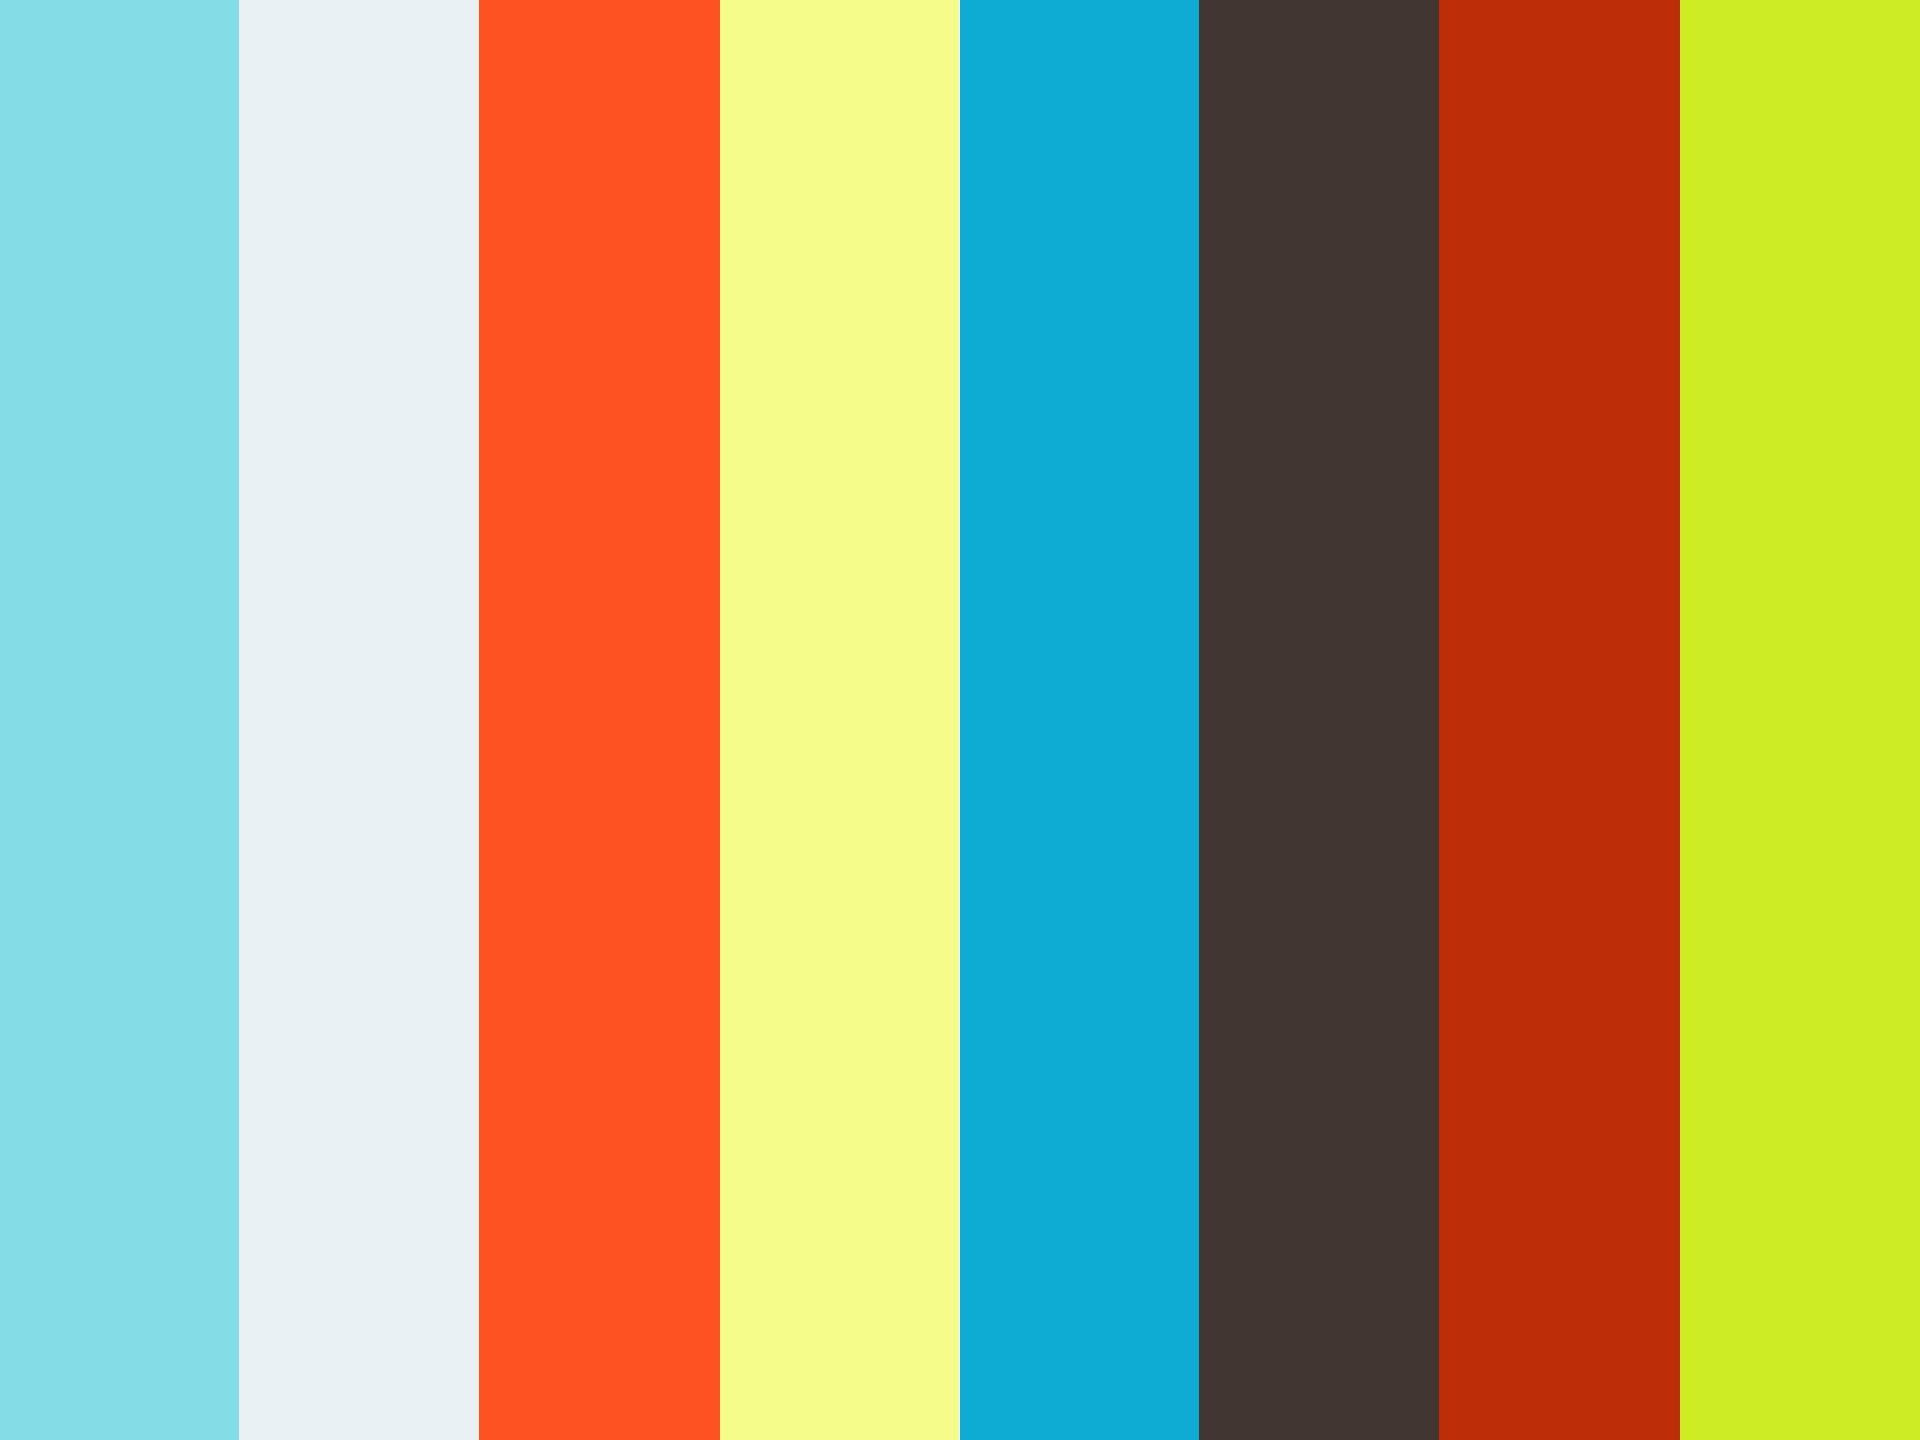 Live Wallpaper App 3d Laniakea Cosmography Visualization On Vimeo